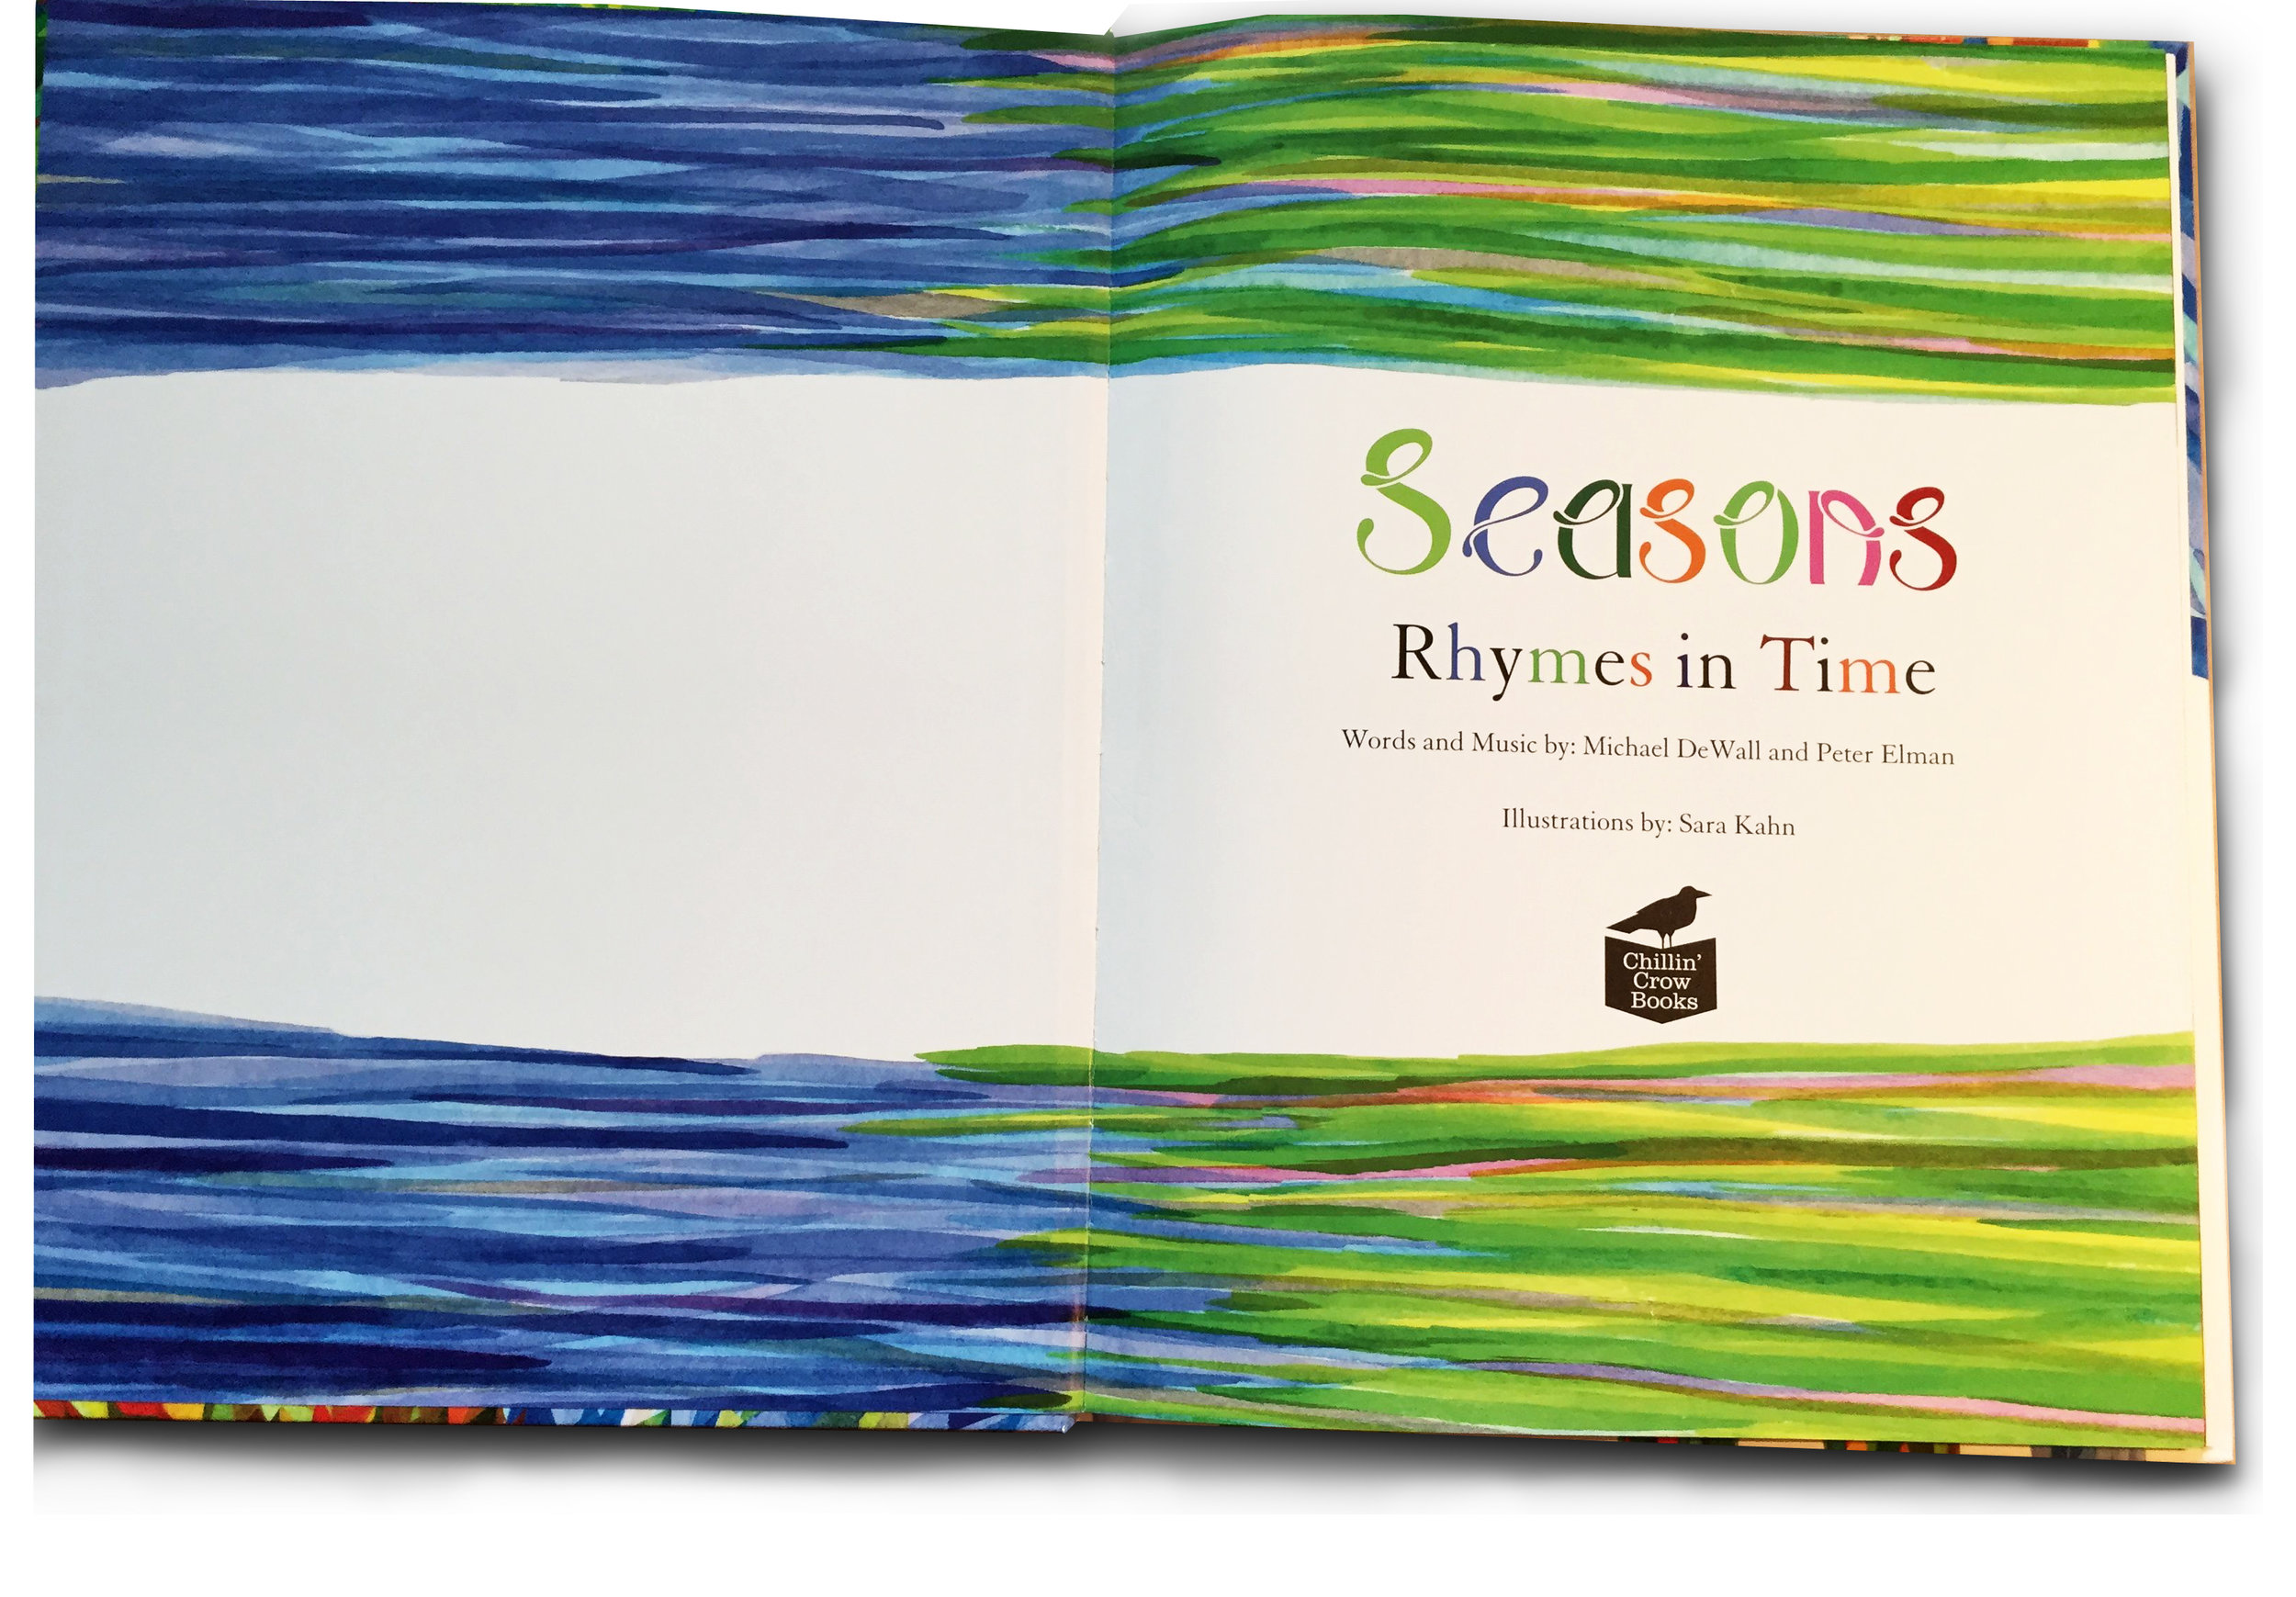 Seasons  4-C endsheets printed on self ends, using 157 gsm (100#) matt art.